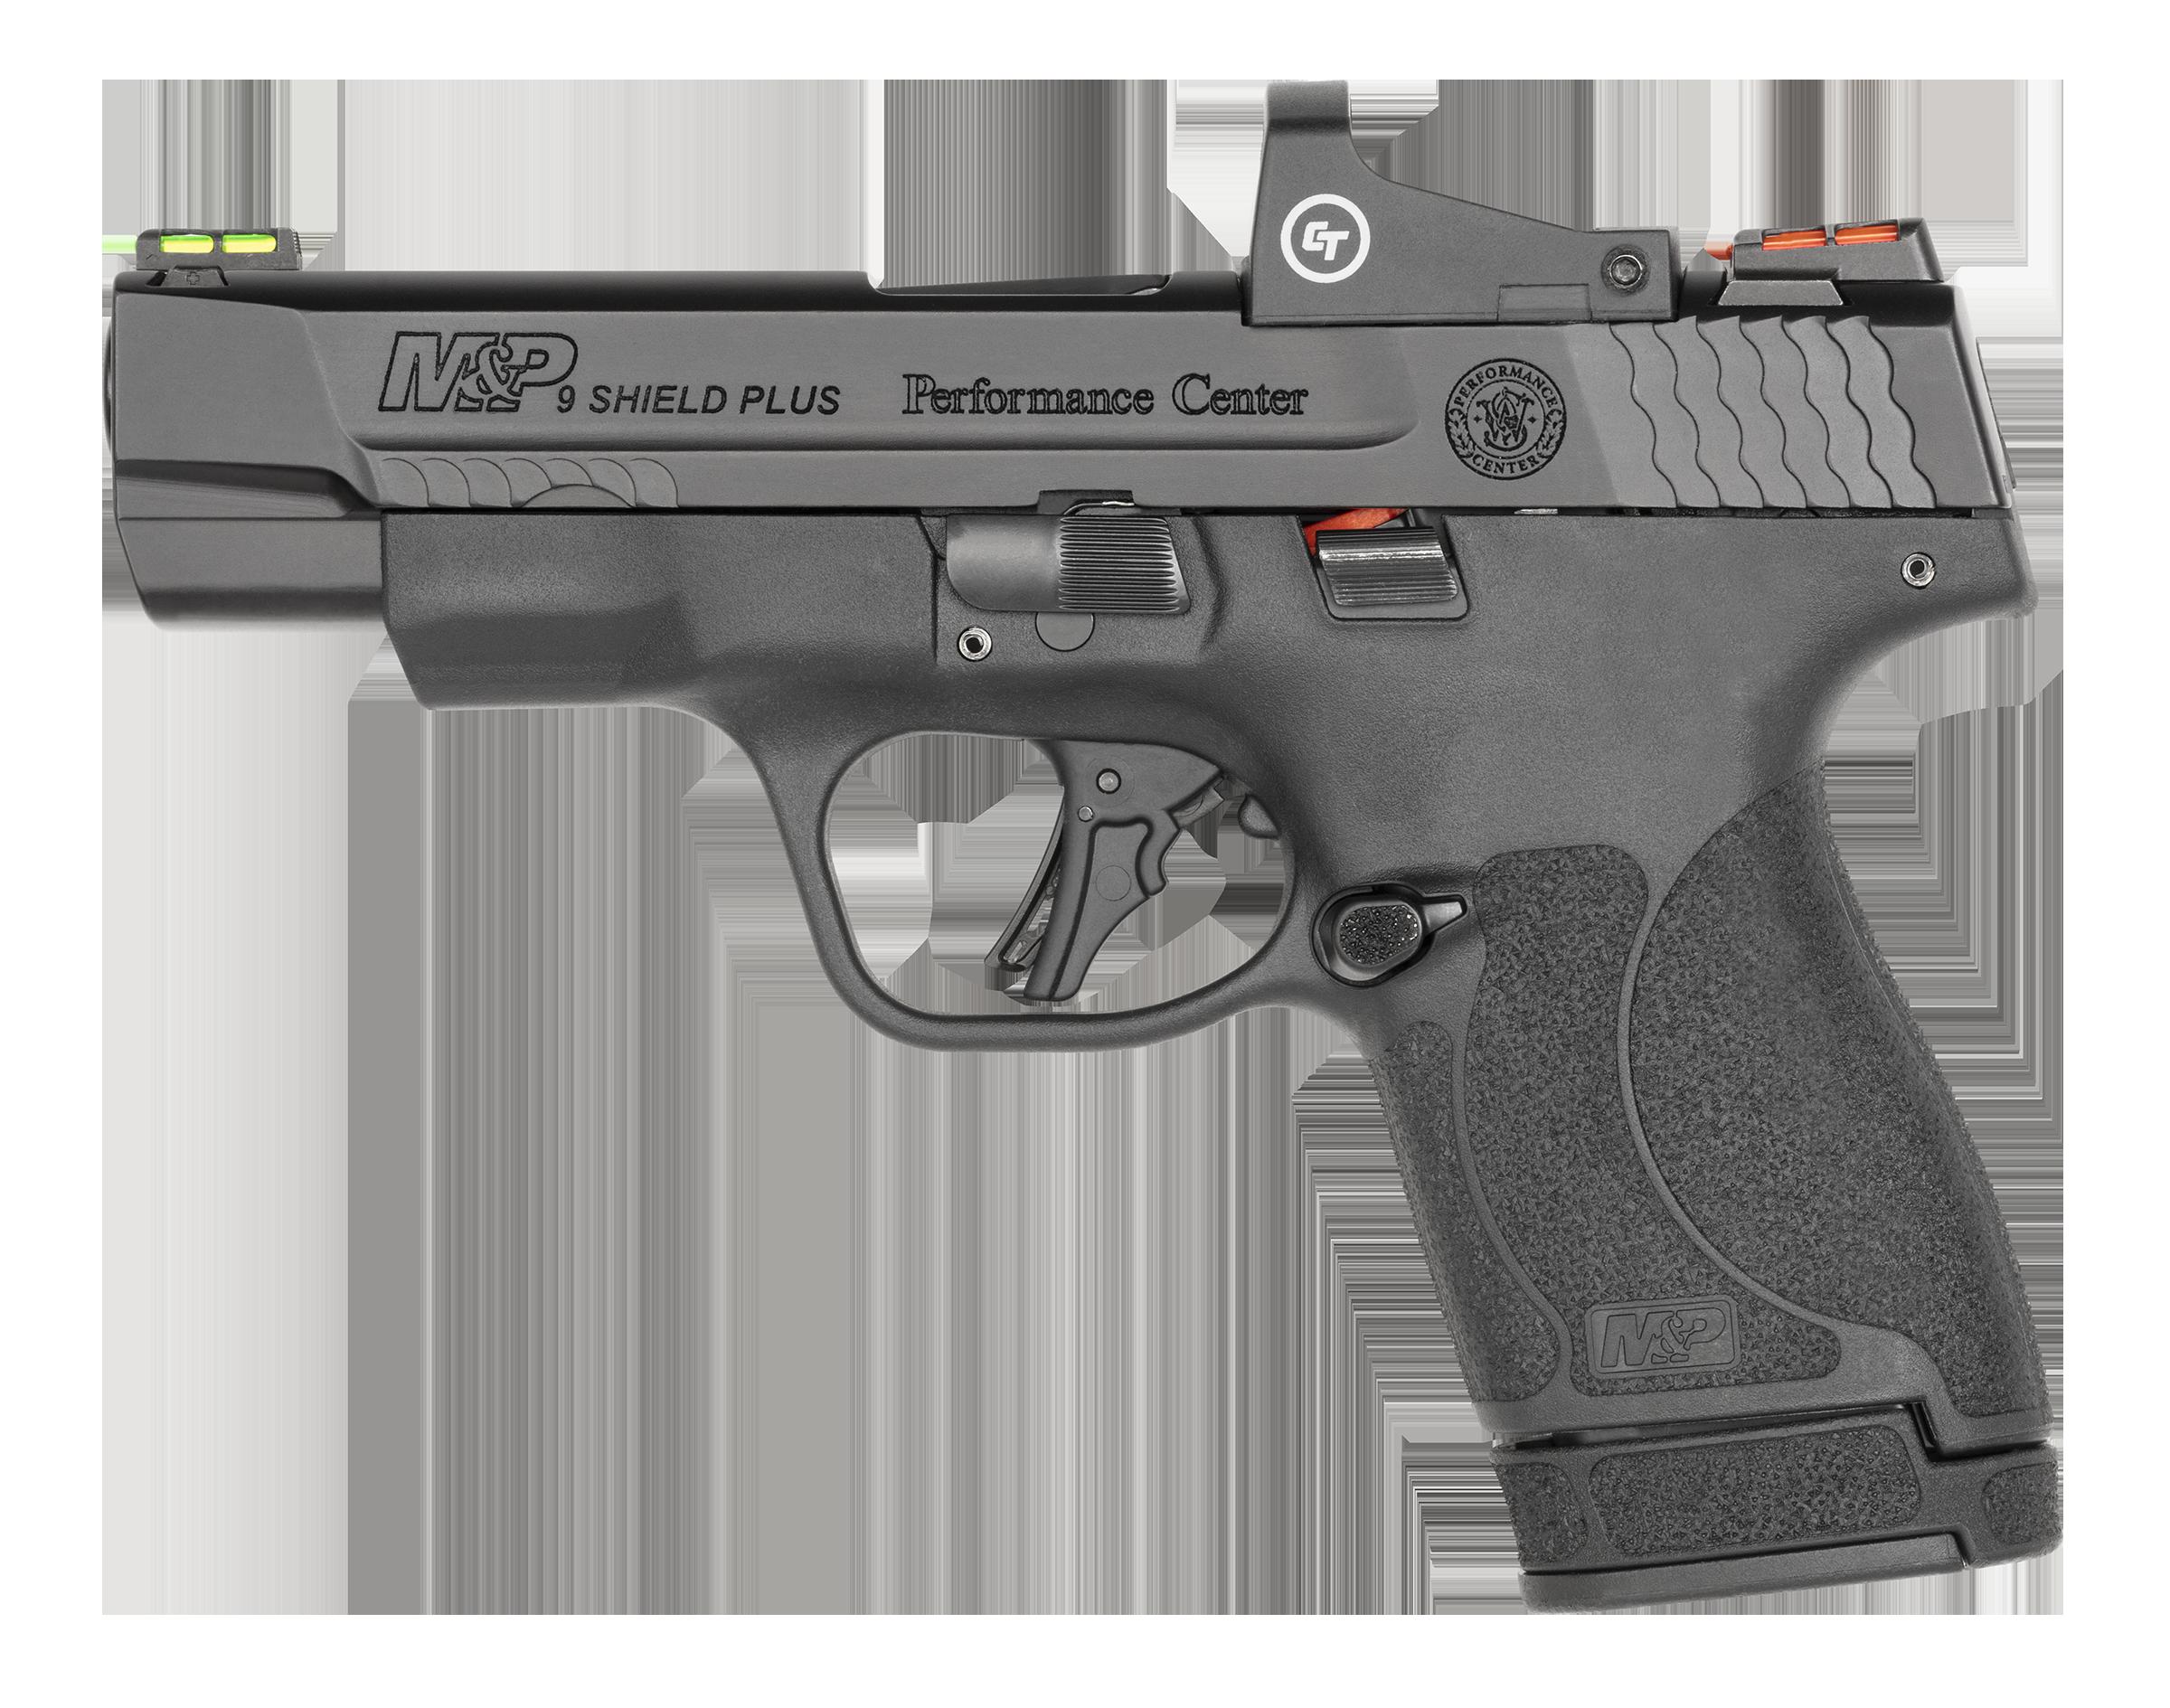 Smith & Wesson M& P9 Shield Plus Performance Center, Crimson Trace Optic, Black (13251)